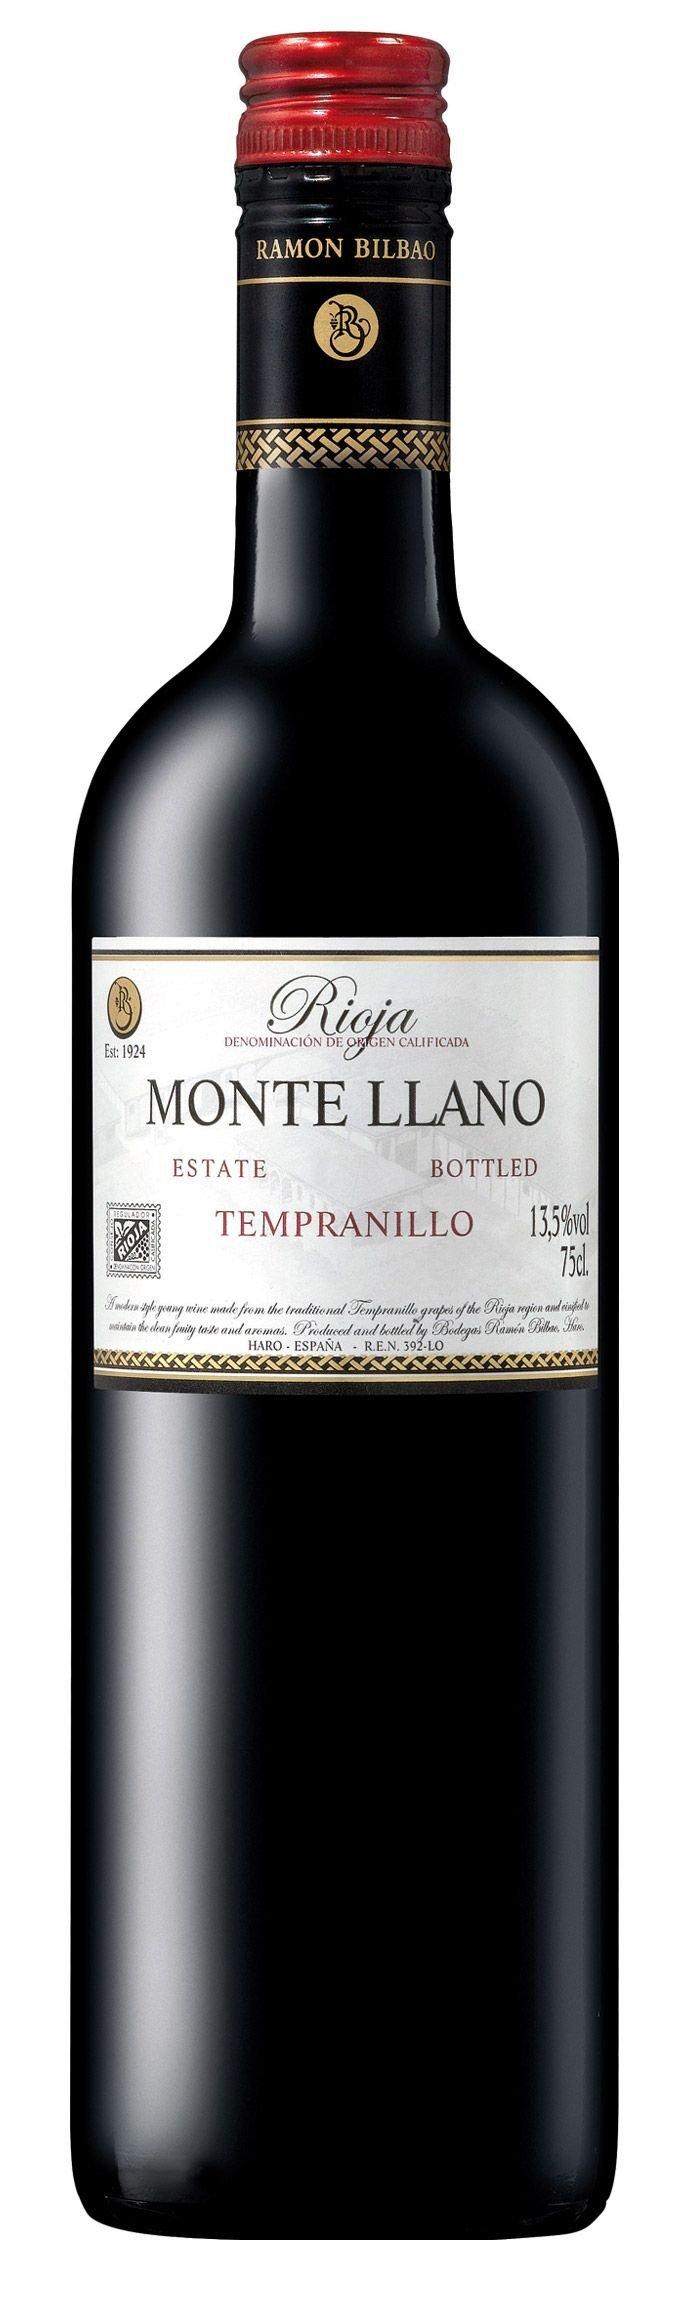 Ramon-Bilbao-Monte-Llano-Tempranillo-2012-trocken-6-x-075-l